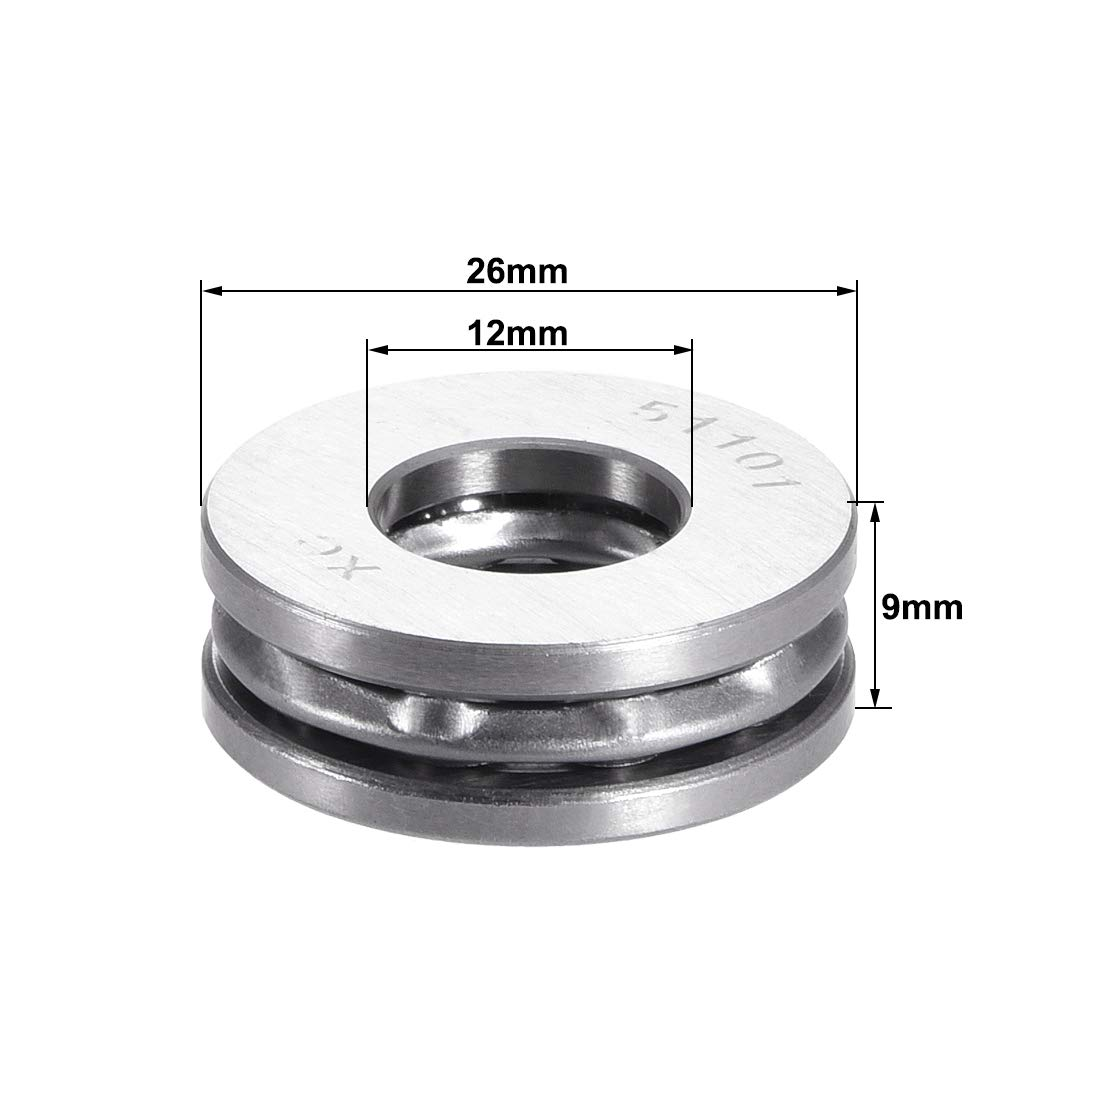 uxcell 51101 Single Direction Thrust Ball Bearings Flat Seat Chromium Steel,12x26x9mm 3pcs